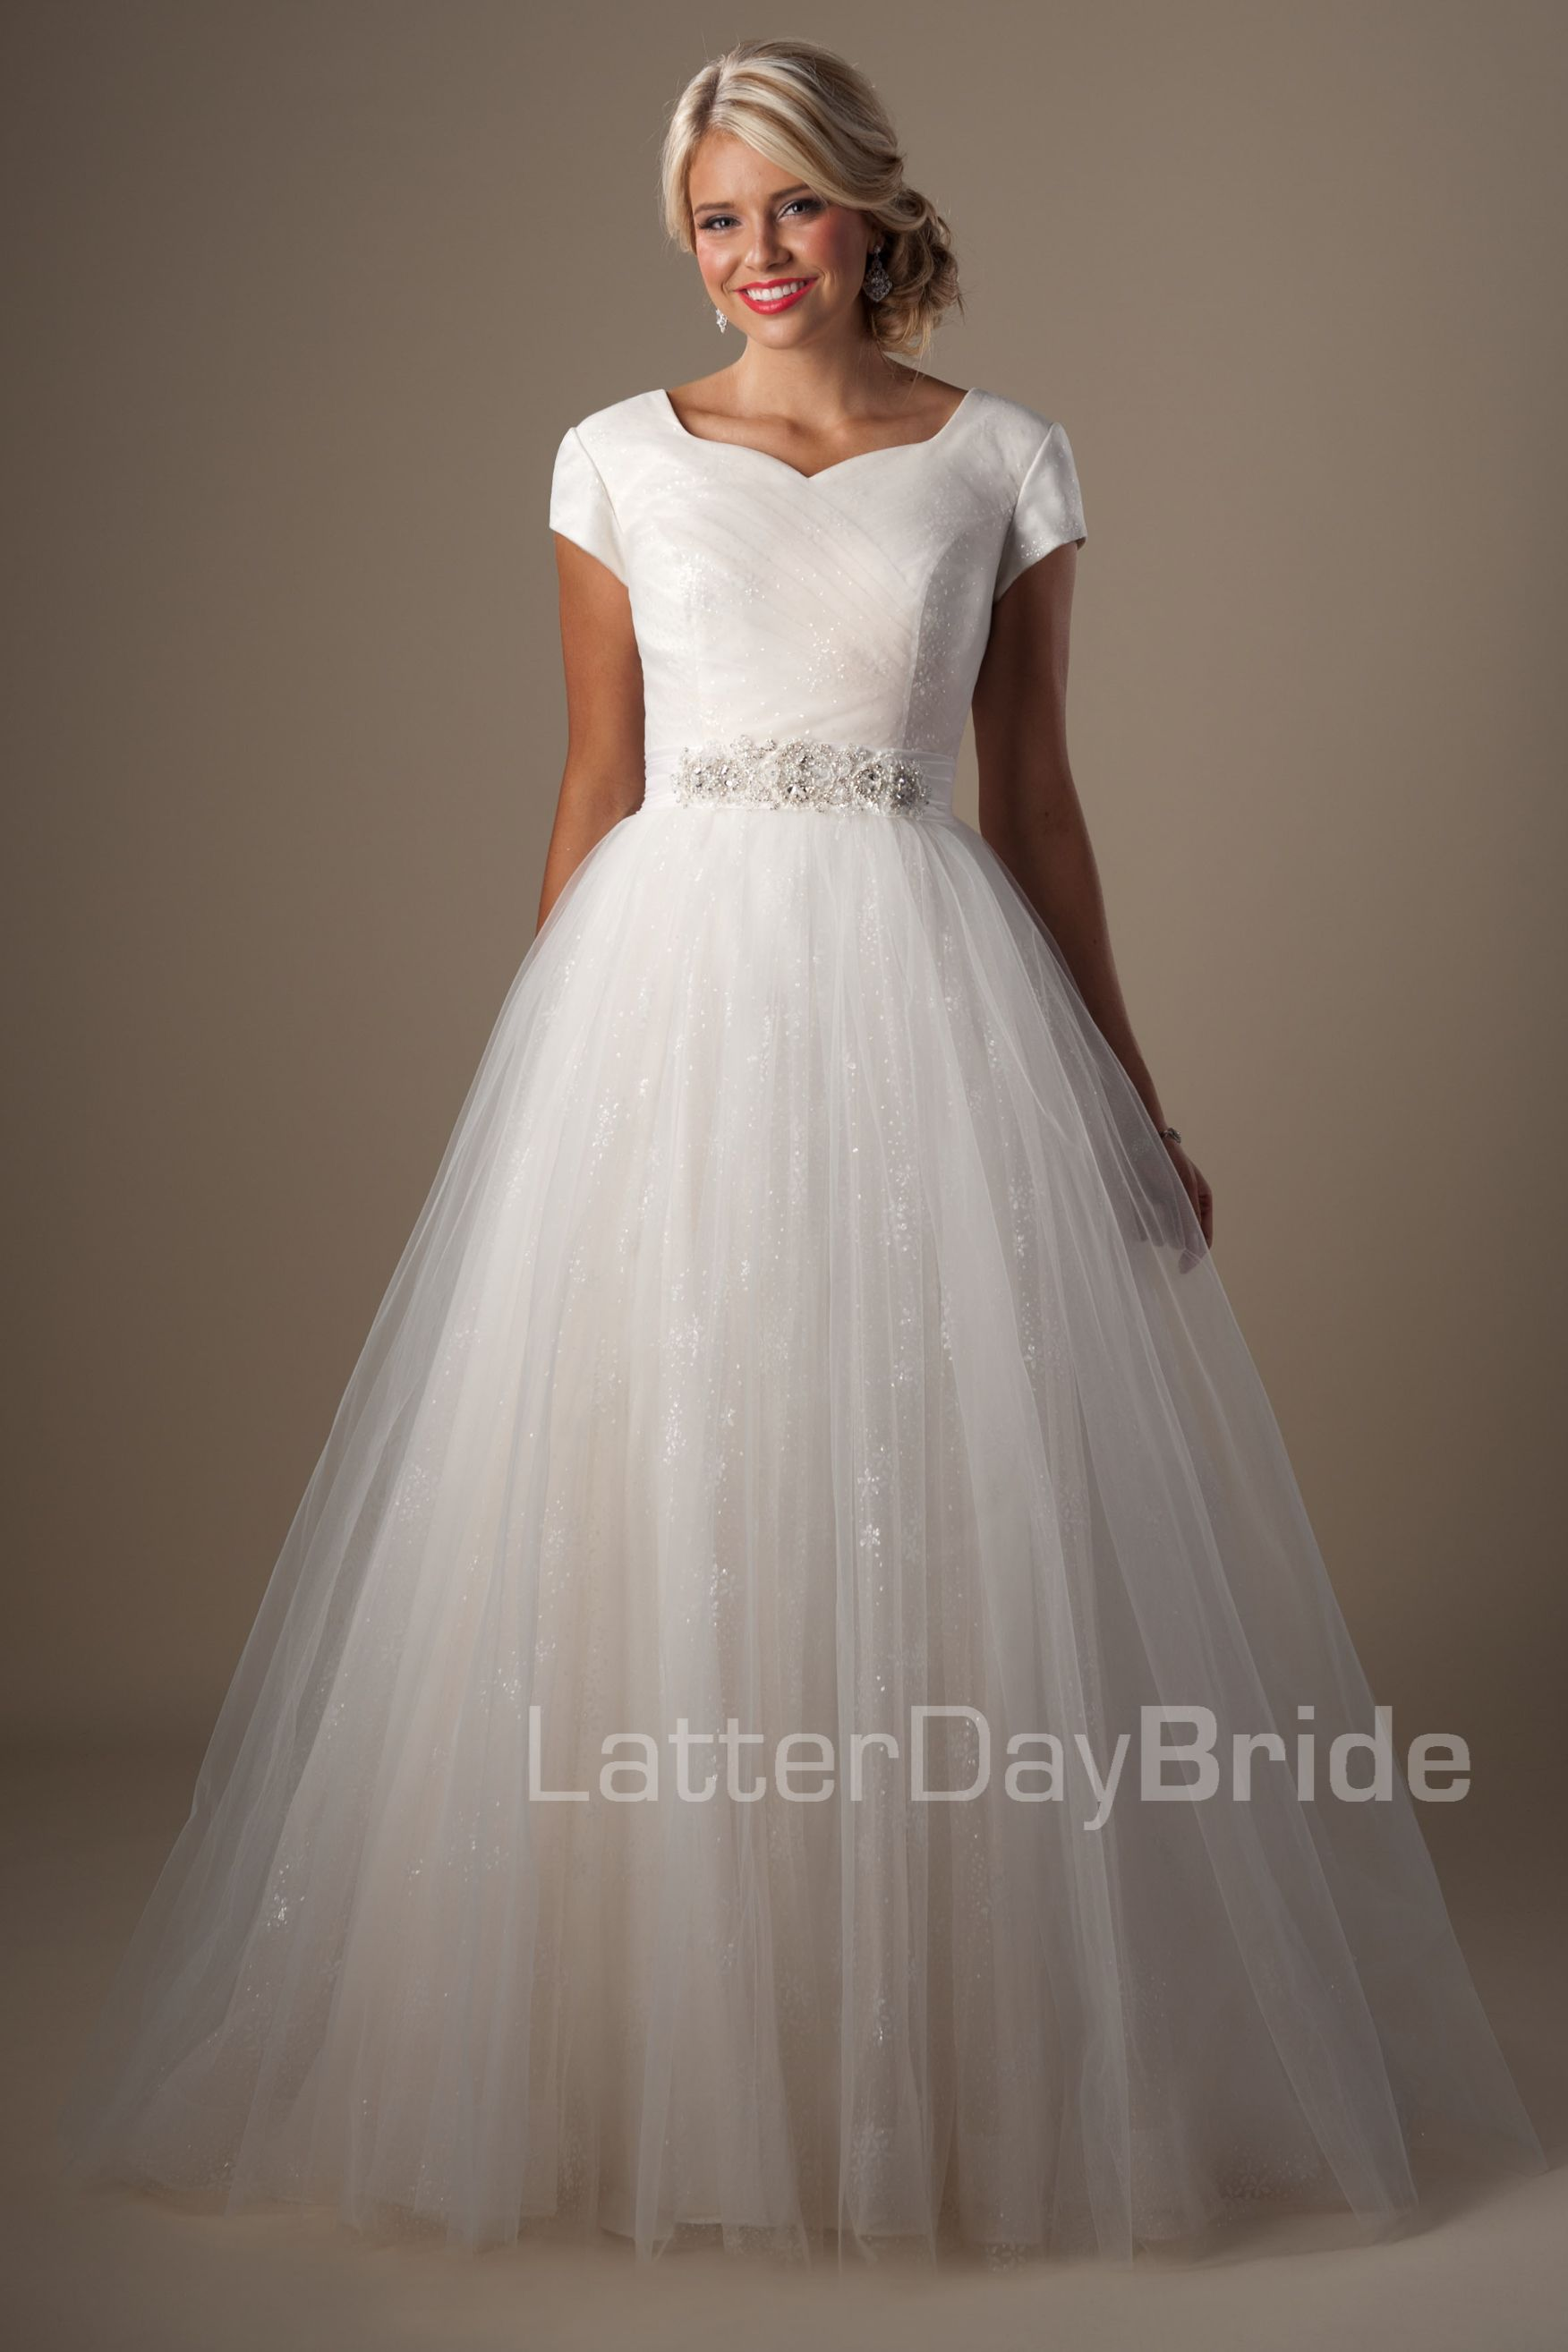 Modest Wedding Dresses : Marillion. Latter Day Bride, Gateway Bridal ...